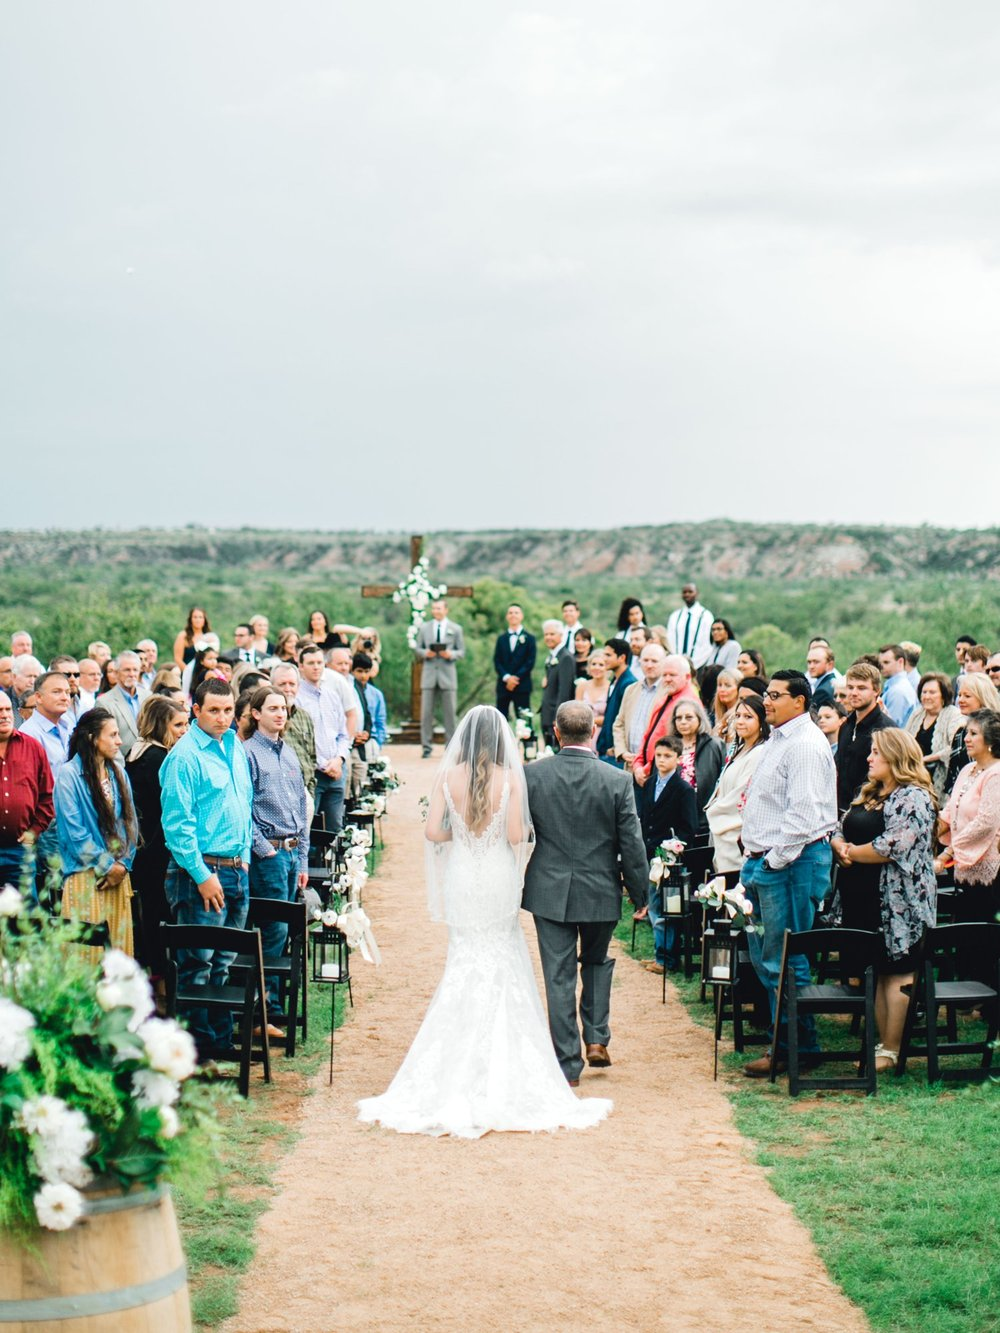 Ashley_John_English_Elegant_Texas_Wedding_Outdoors_Ranch_Caprock_Winery_ALLEEJ_0108.jpg